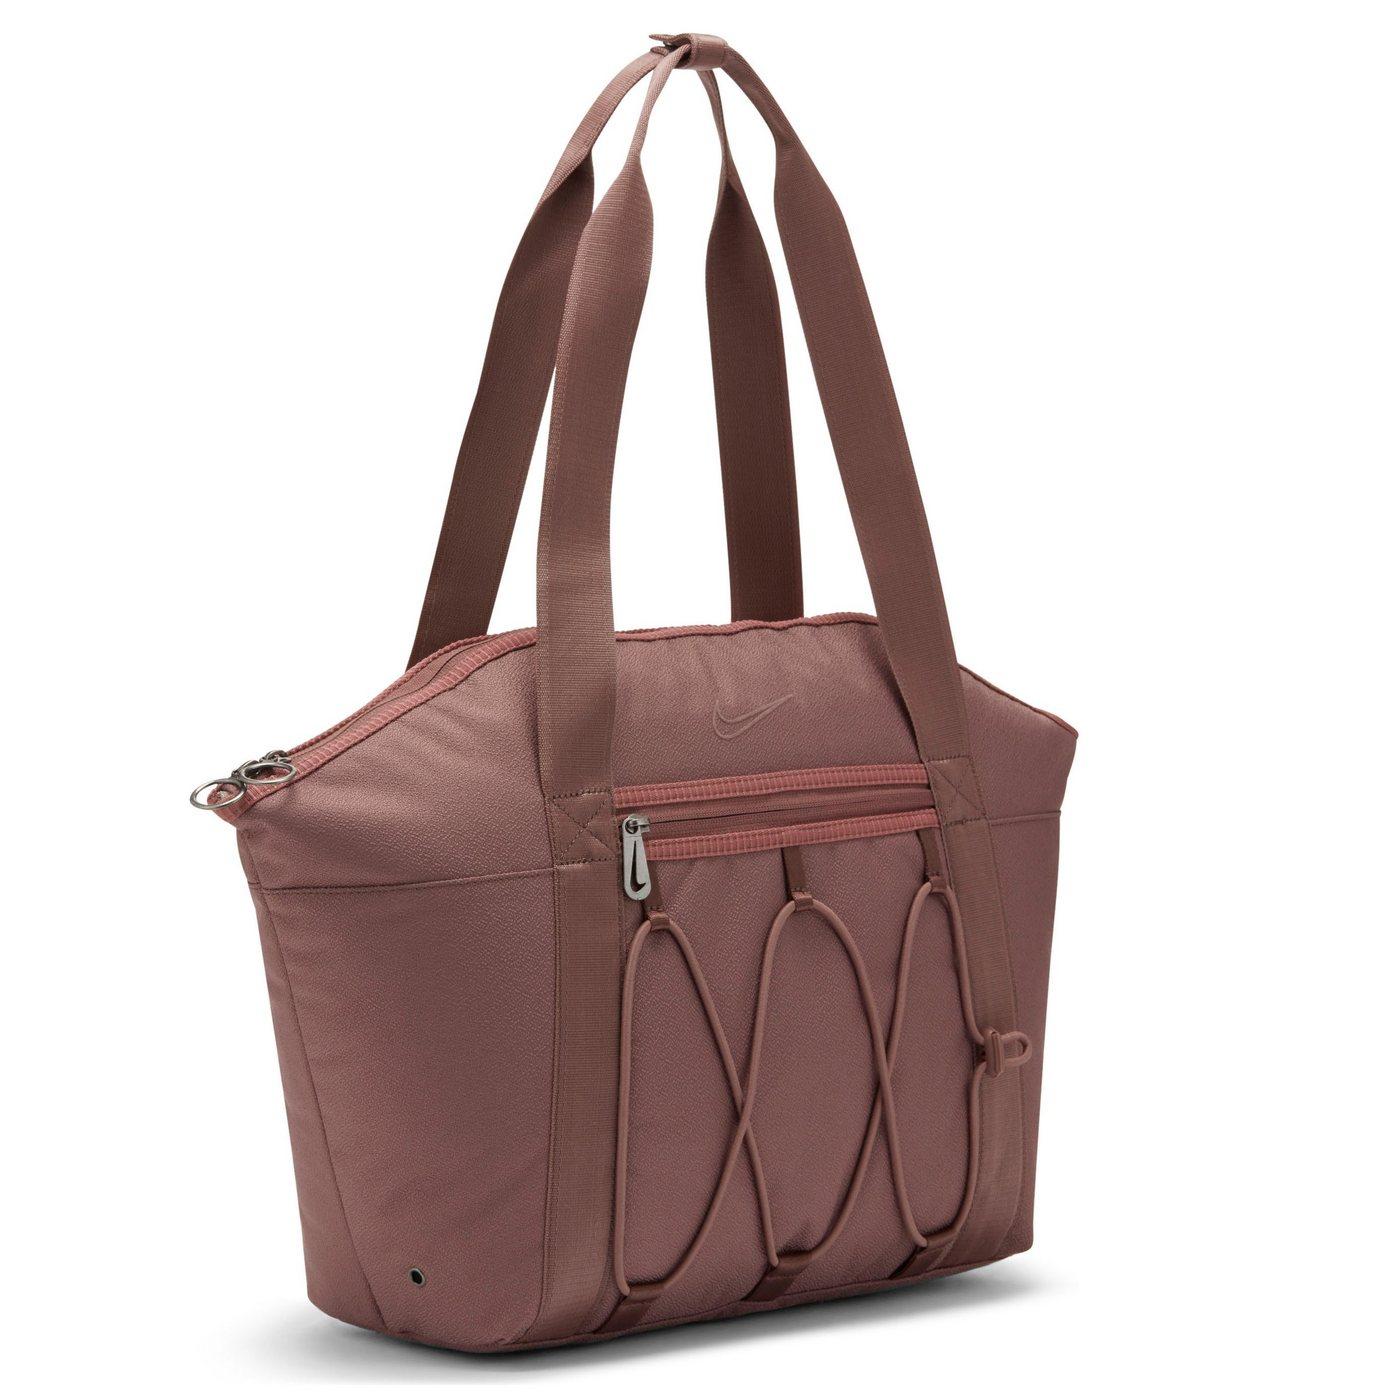 nike -  Sporttasche » One Women's Training Tote Bag«